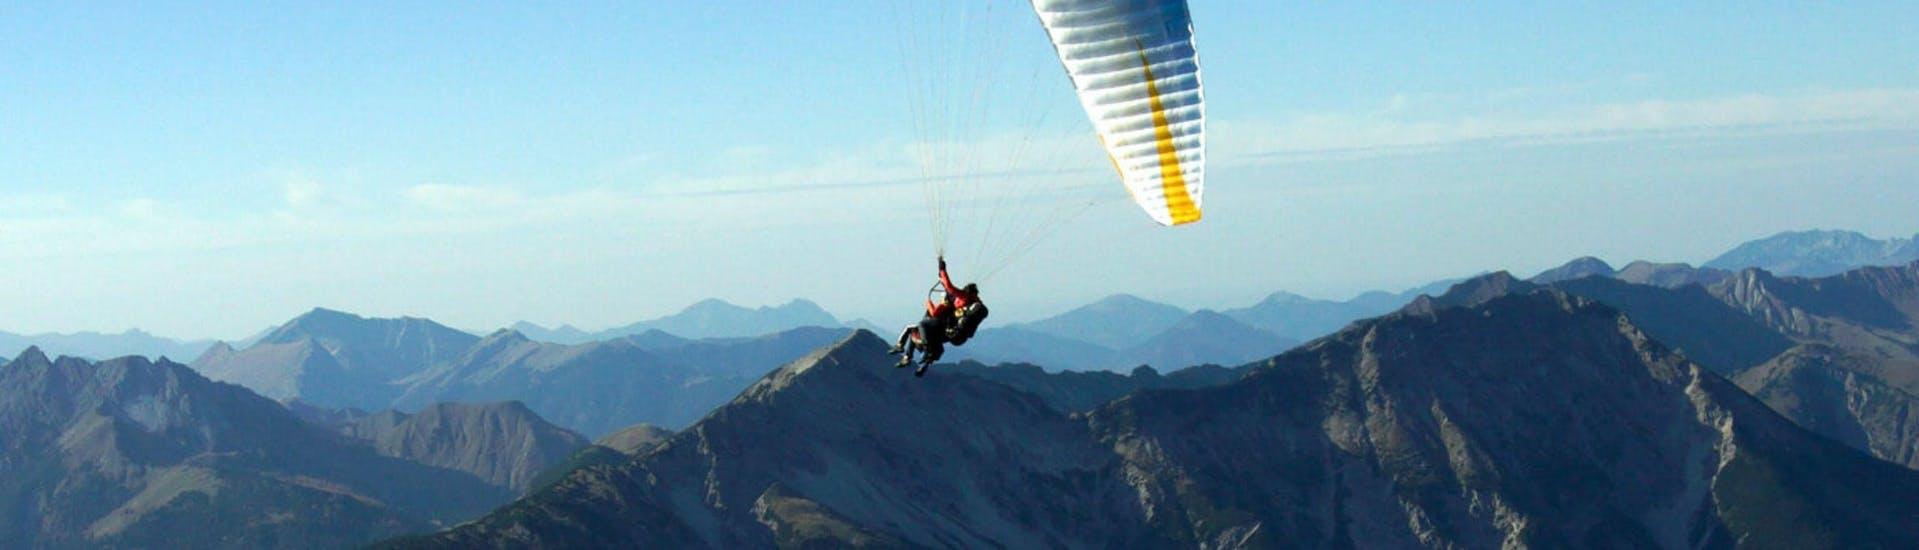 tandem-paragliding-happy-tandem-achensee-hero